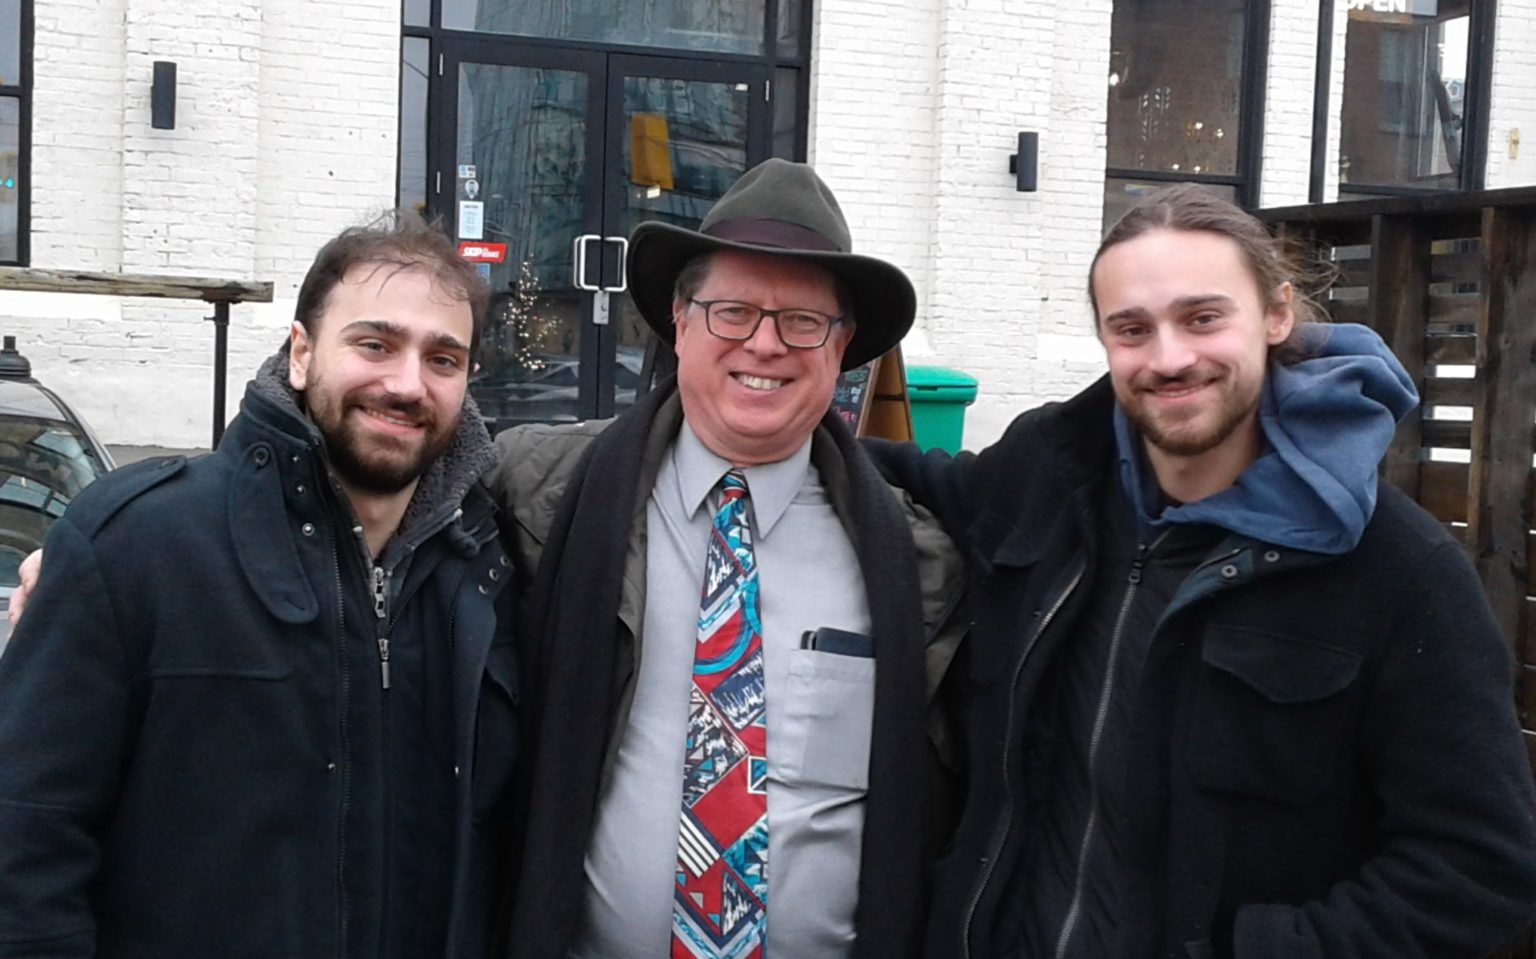 Alessio Occhicone, Bob Jonkman, and Diego Occhicone